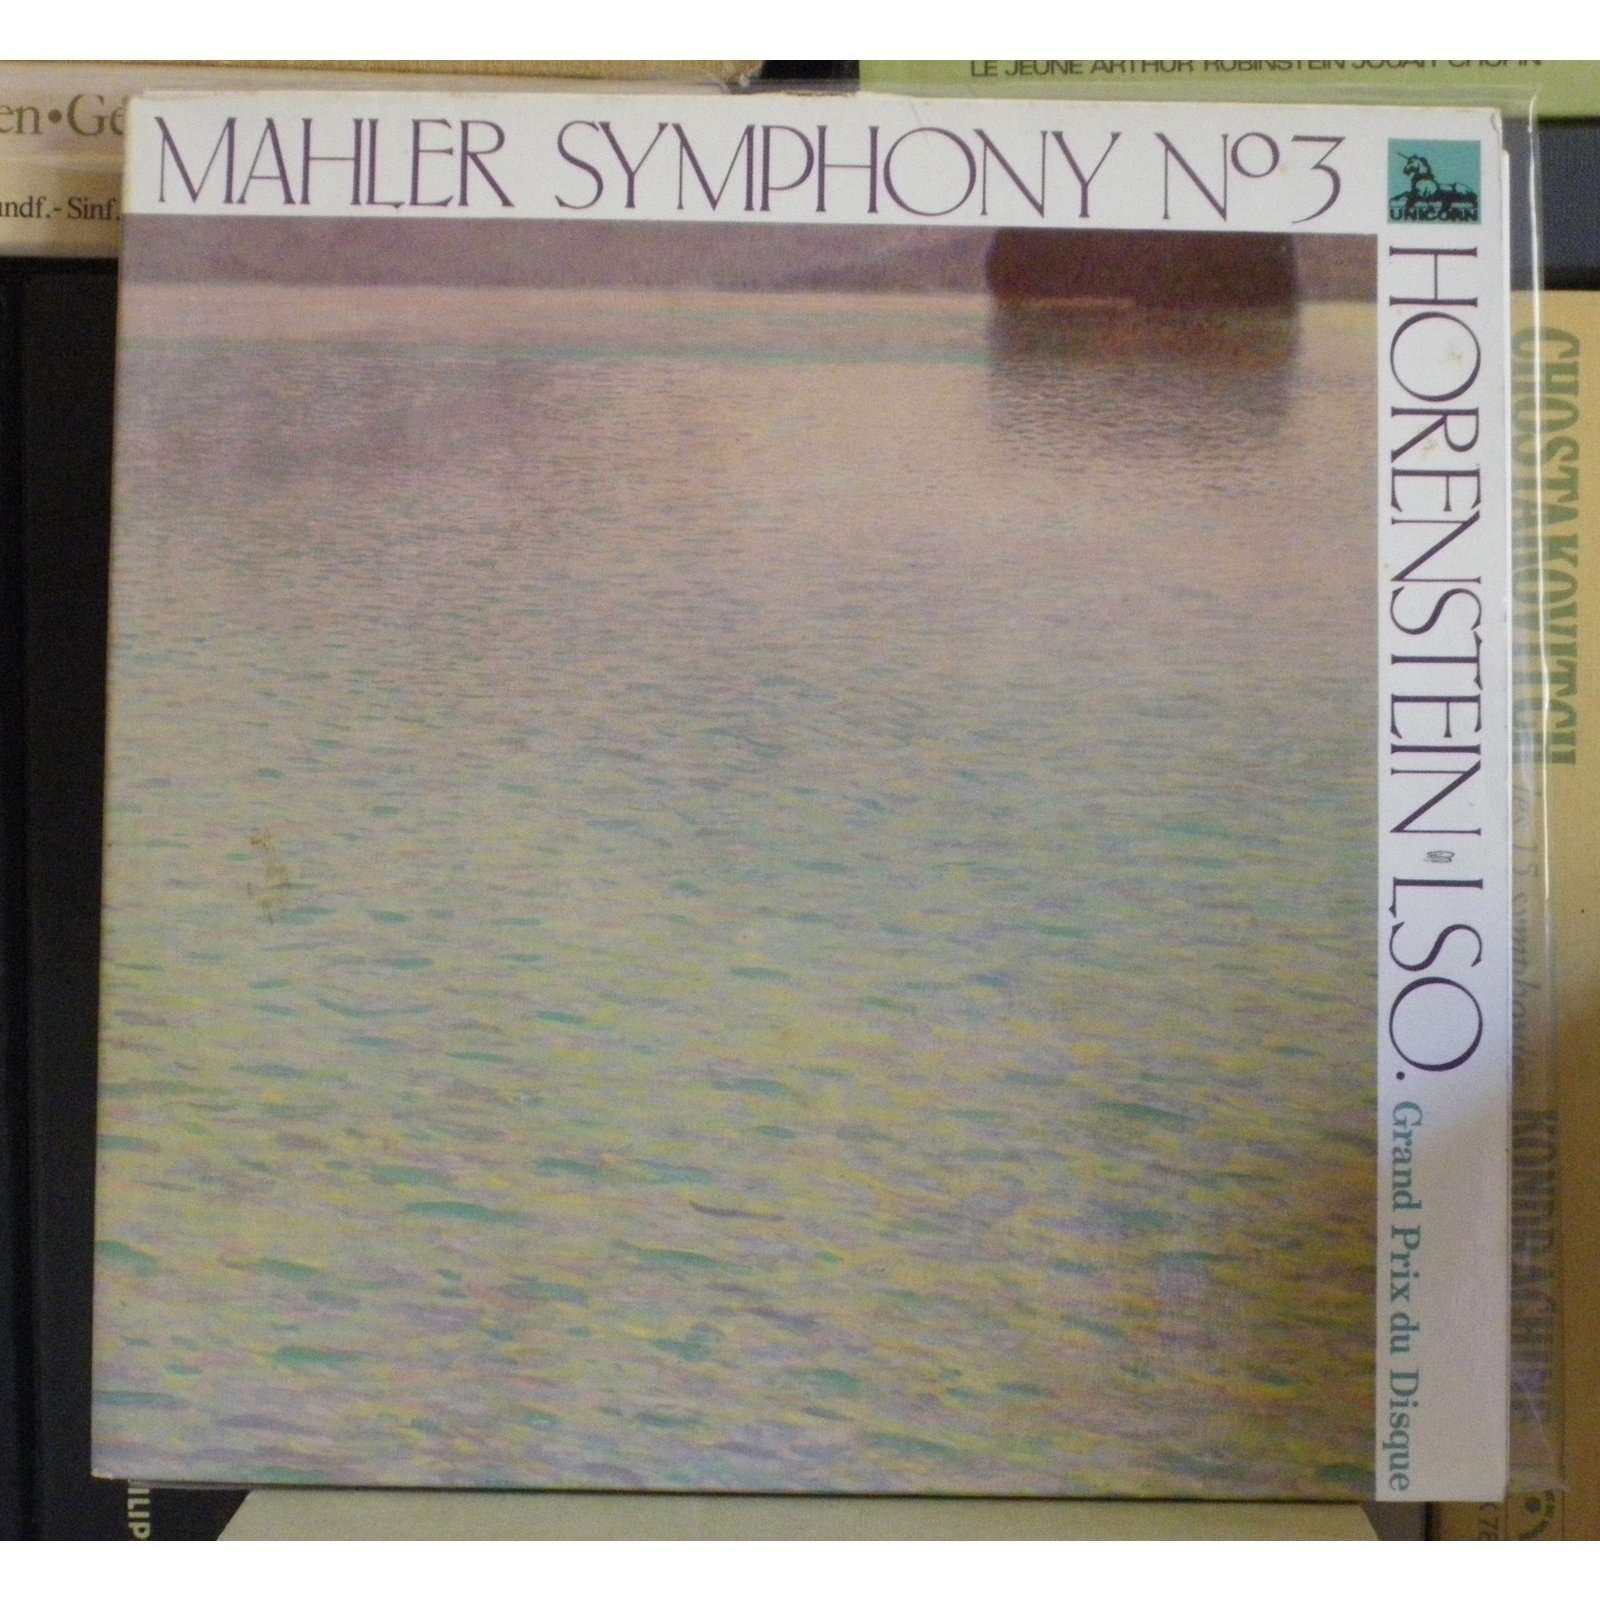 Mahler Symphonie 3 Jascha Horenstein Mahler Symphonie 3 - Norma Procter, Jascha Horenstein